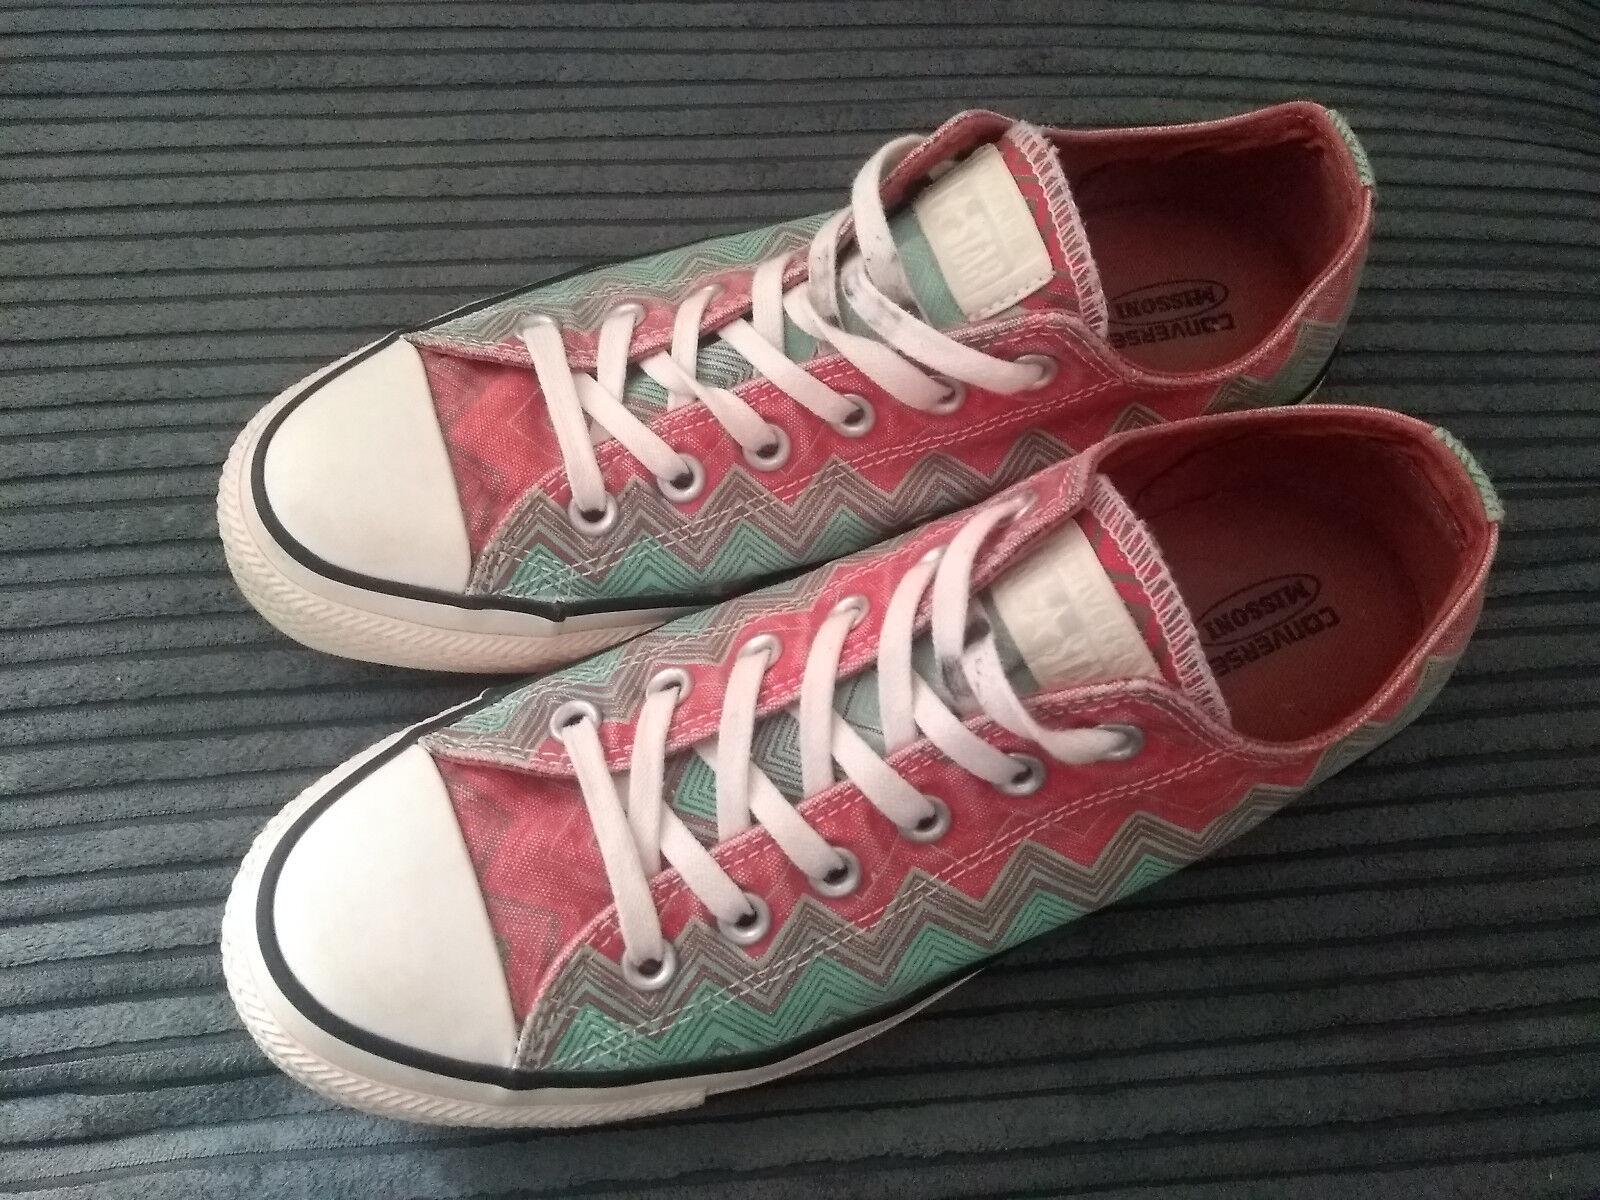 UNISEX USED SIZE 8 UK CONVERSE ALL-STAR MISSONI PINK TURQUOISE ZIGZAG VGC Schuhe